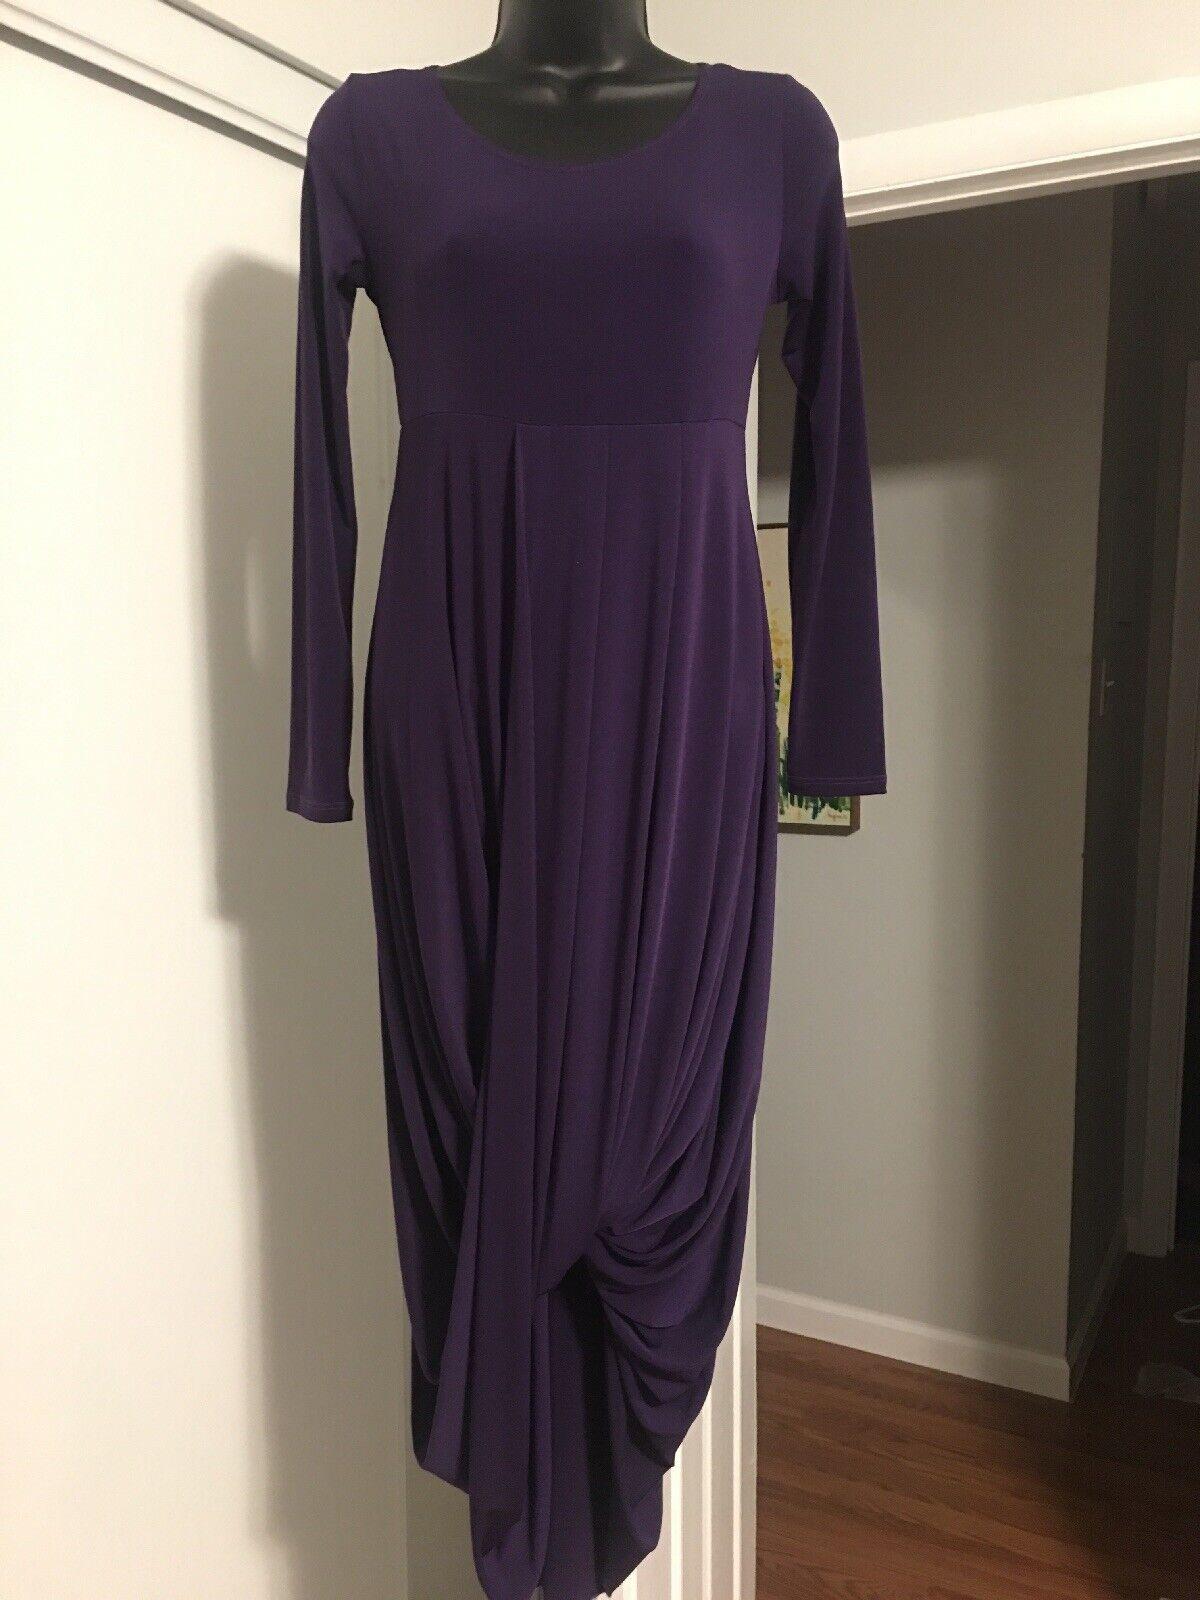 DUCCI Purple Long Sleeve Layered Throughout Knee Length Tunic Dress Sz S R1